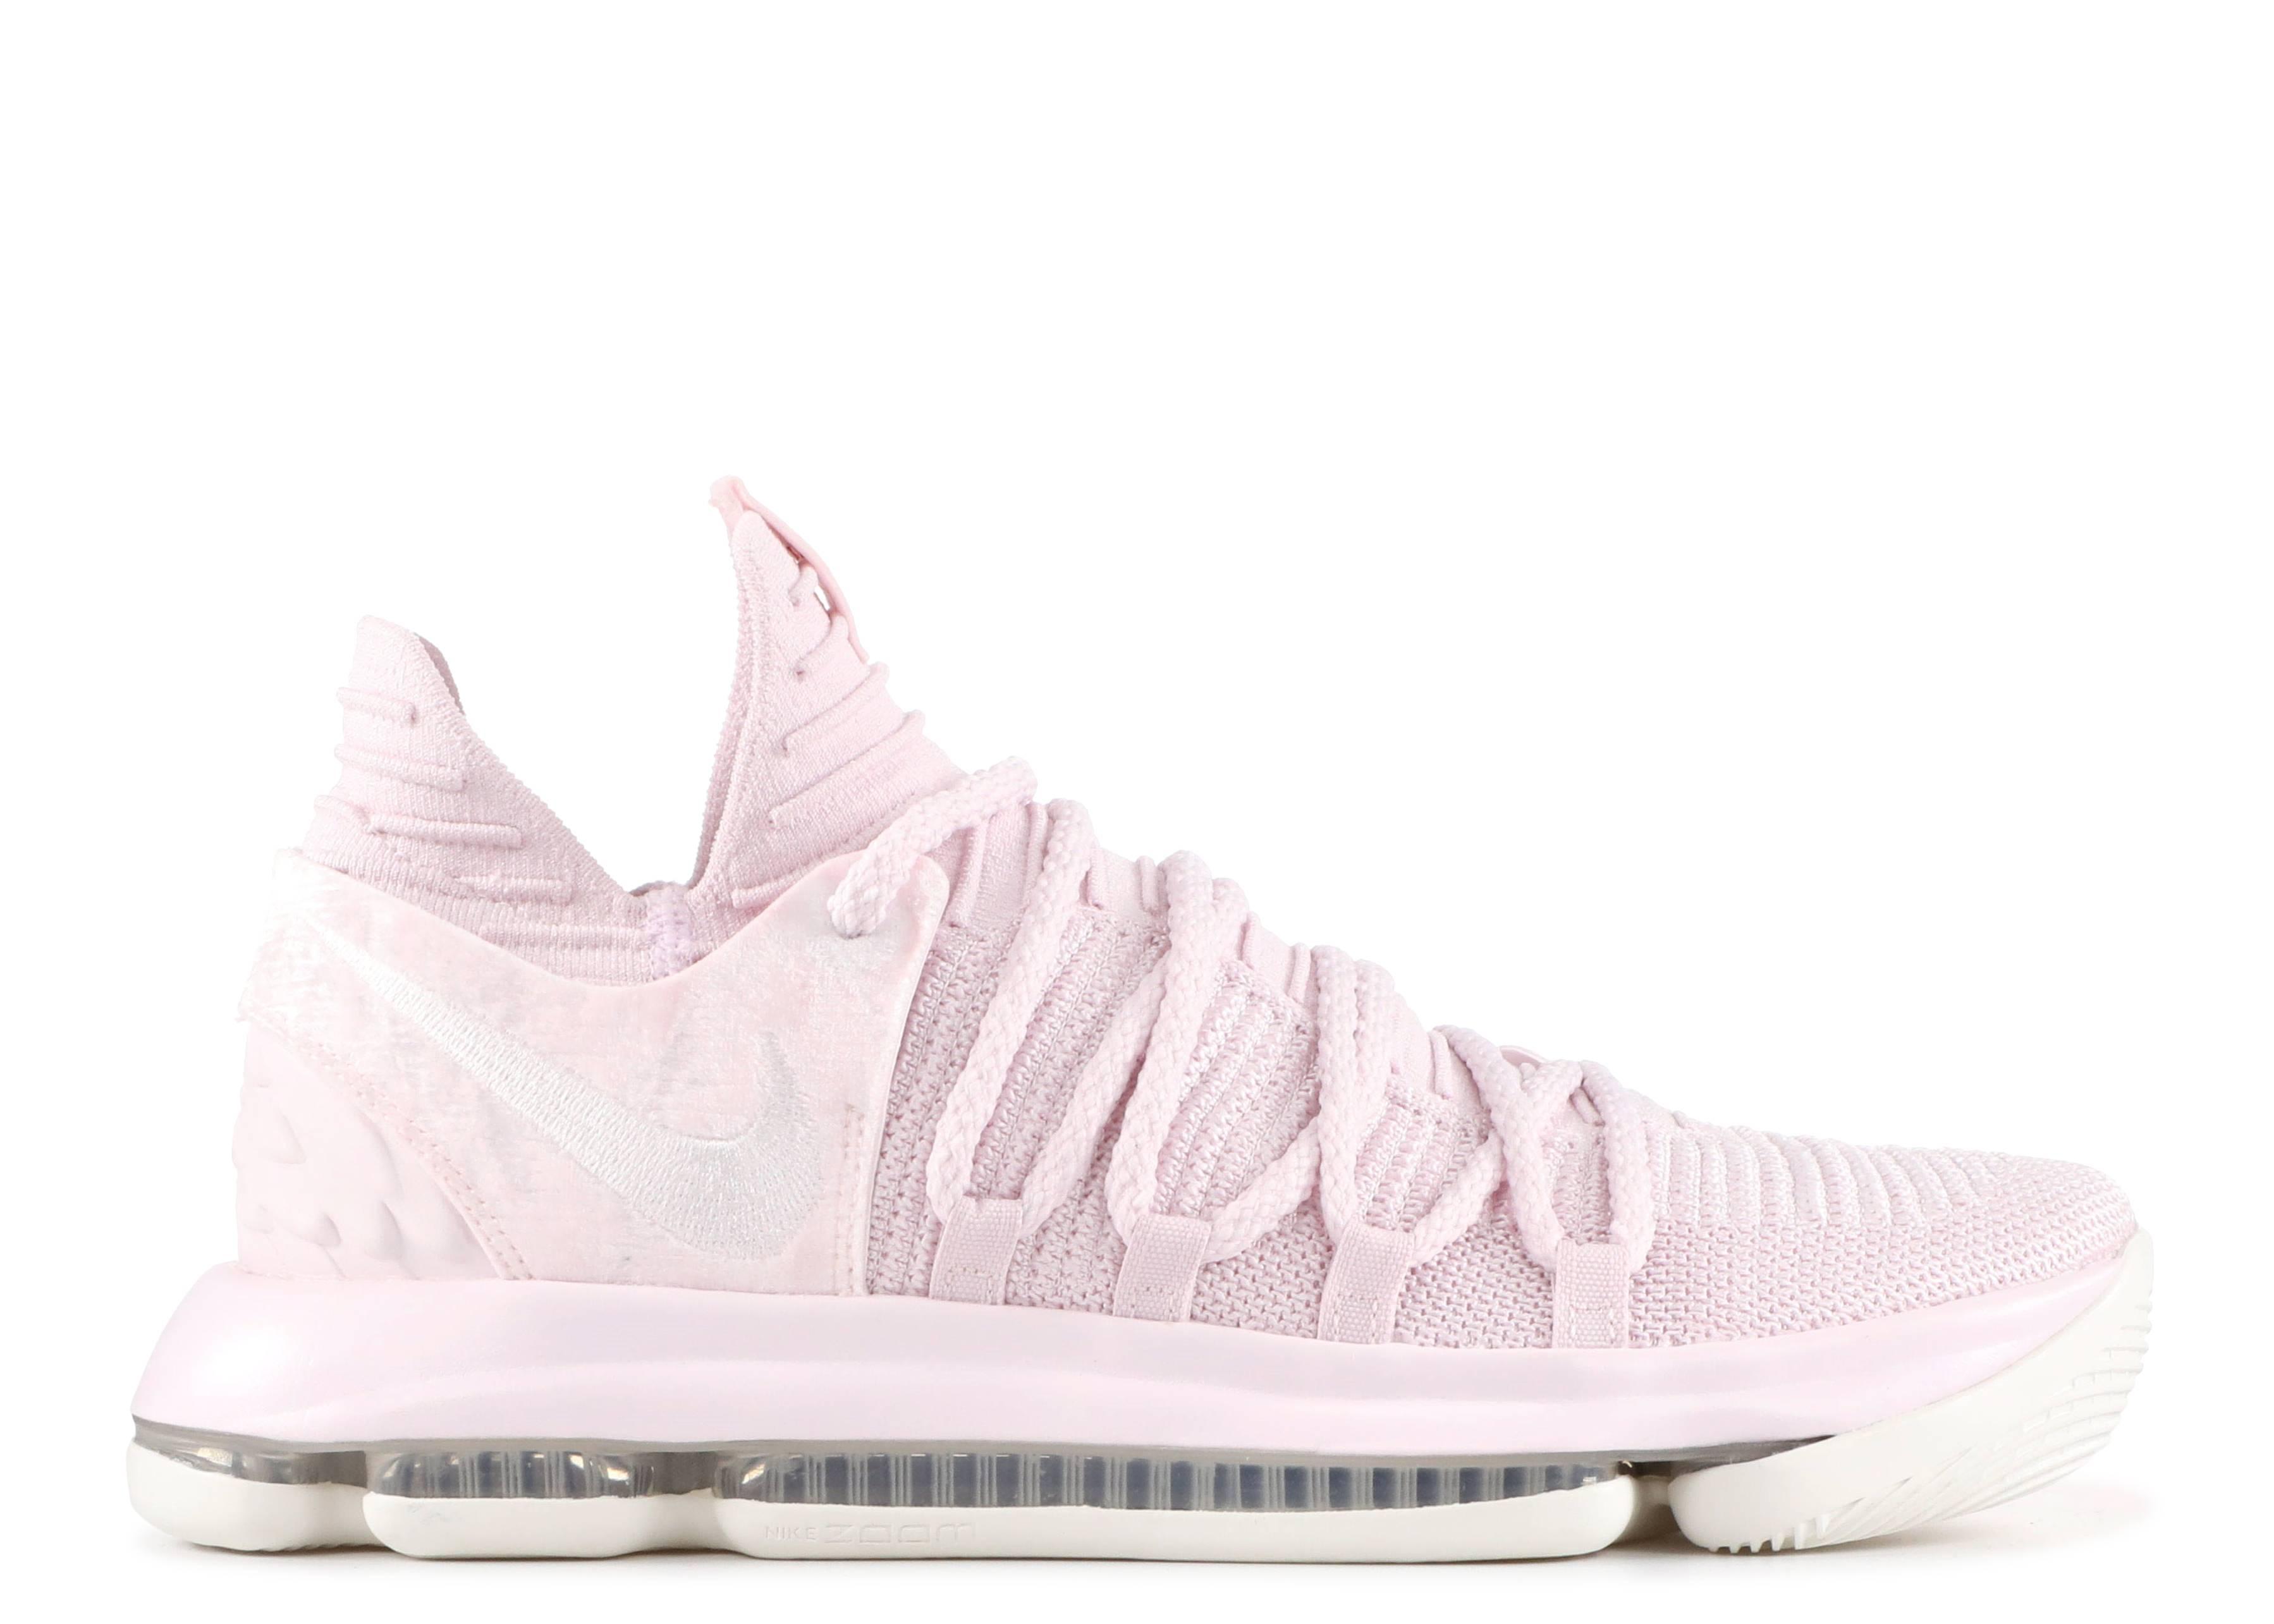 4a6f2bfed0de Nike Zoom KD10 AP - Nike - AQ4110 600 - pearl pink white-sail ...